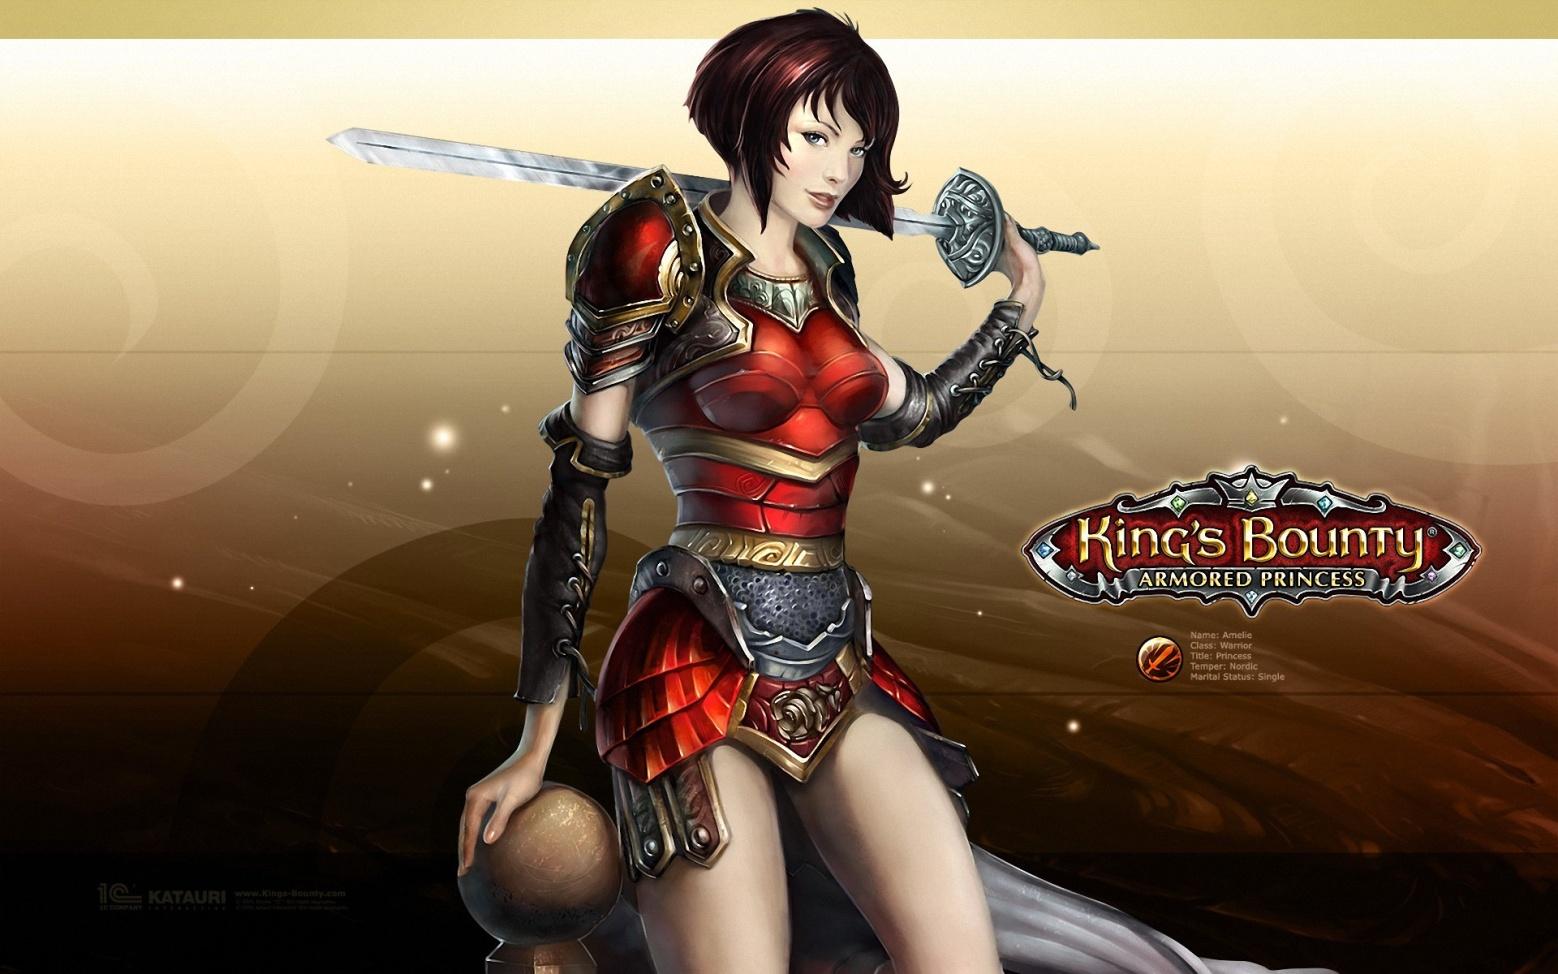 D:\jkz\разработки\персонажи\game_king-s-bounty-armored-princess_05-1920x1200.jpg